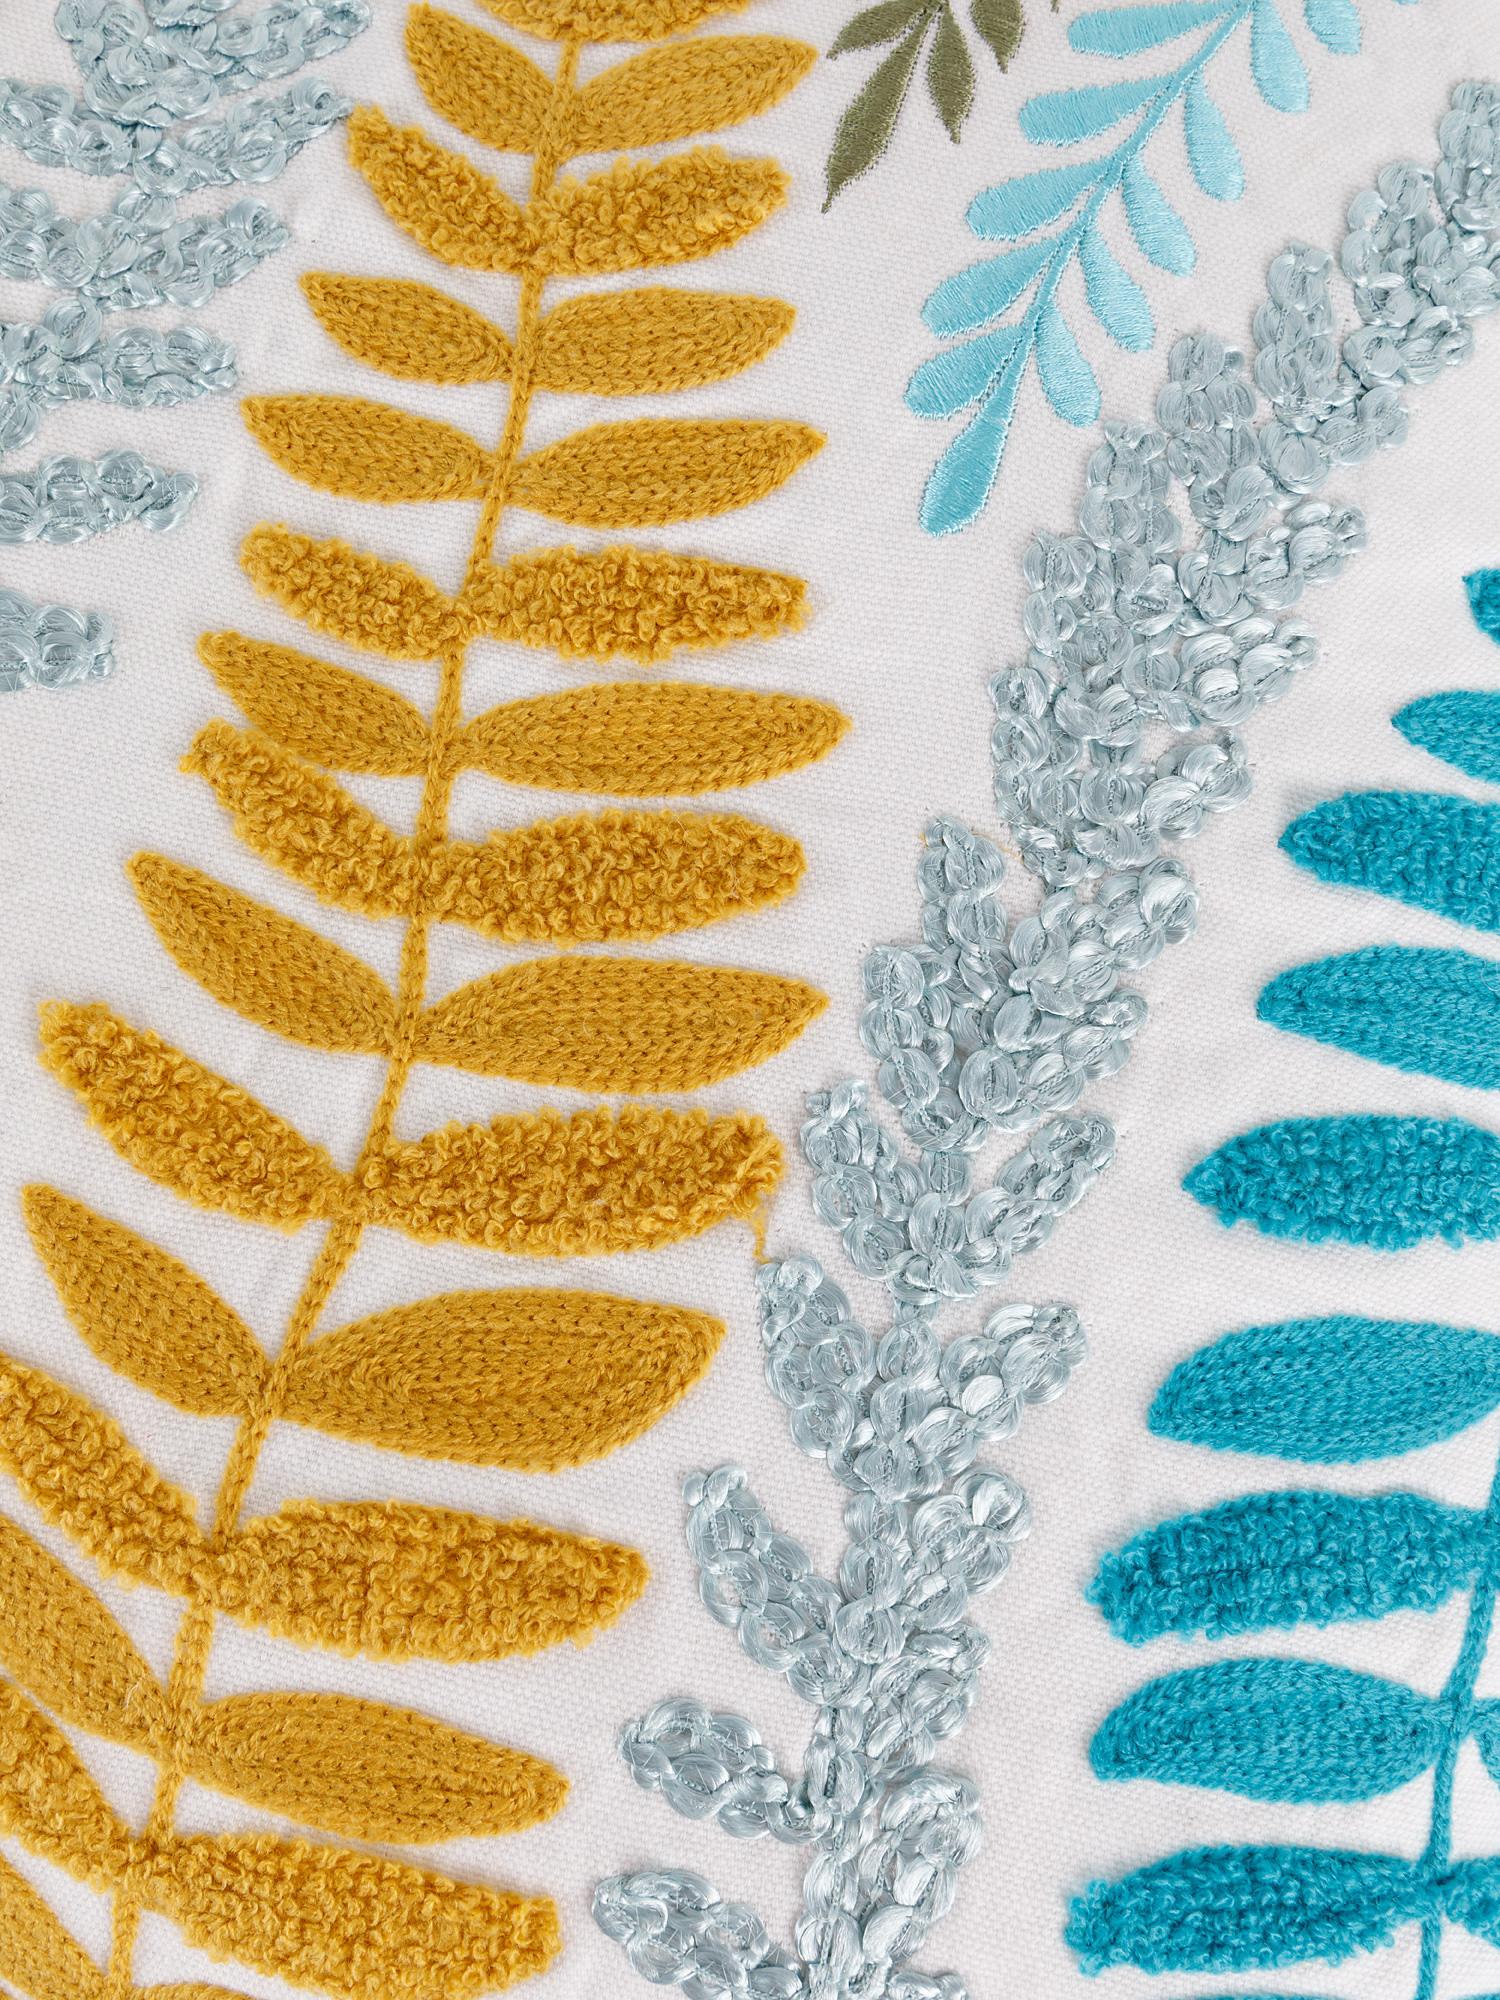 Cuscino cotone ricamo foglie 45x45cm, Multicolor, large image number 2